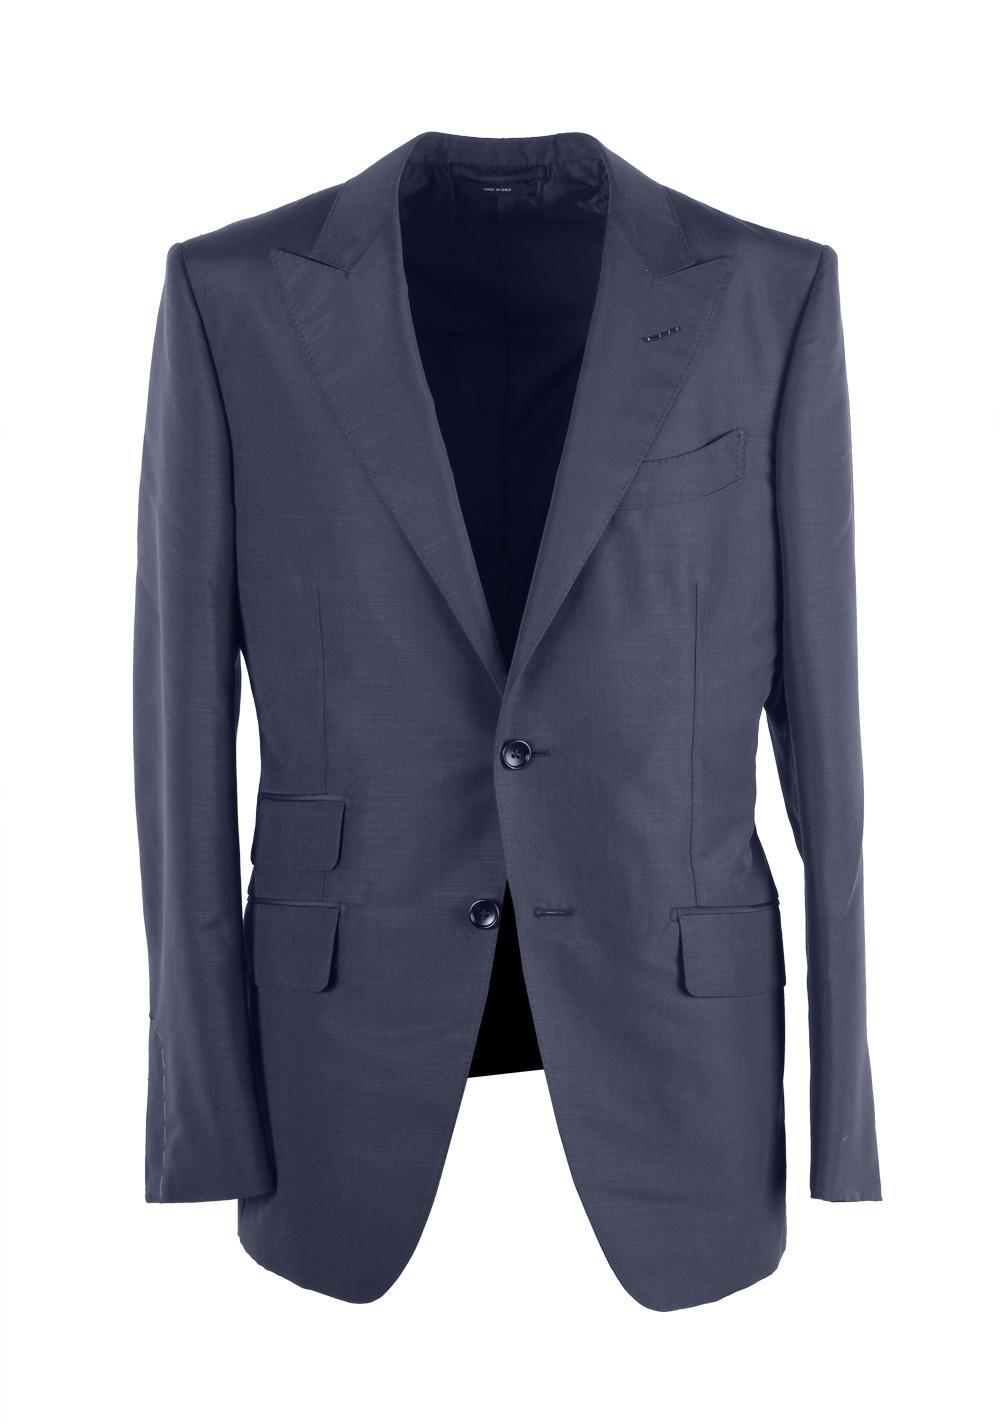 TOM FORD O'Connor Blue Suit Size 48 / 38R U.S. Mohair Silk Fit Y | Costume Limité